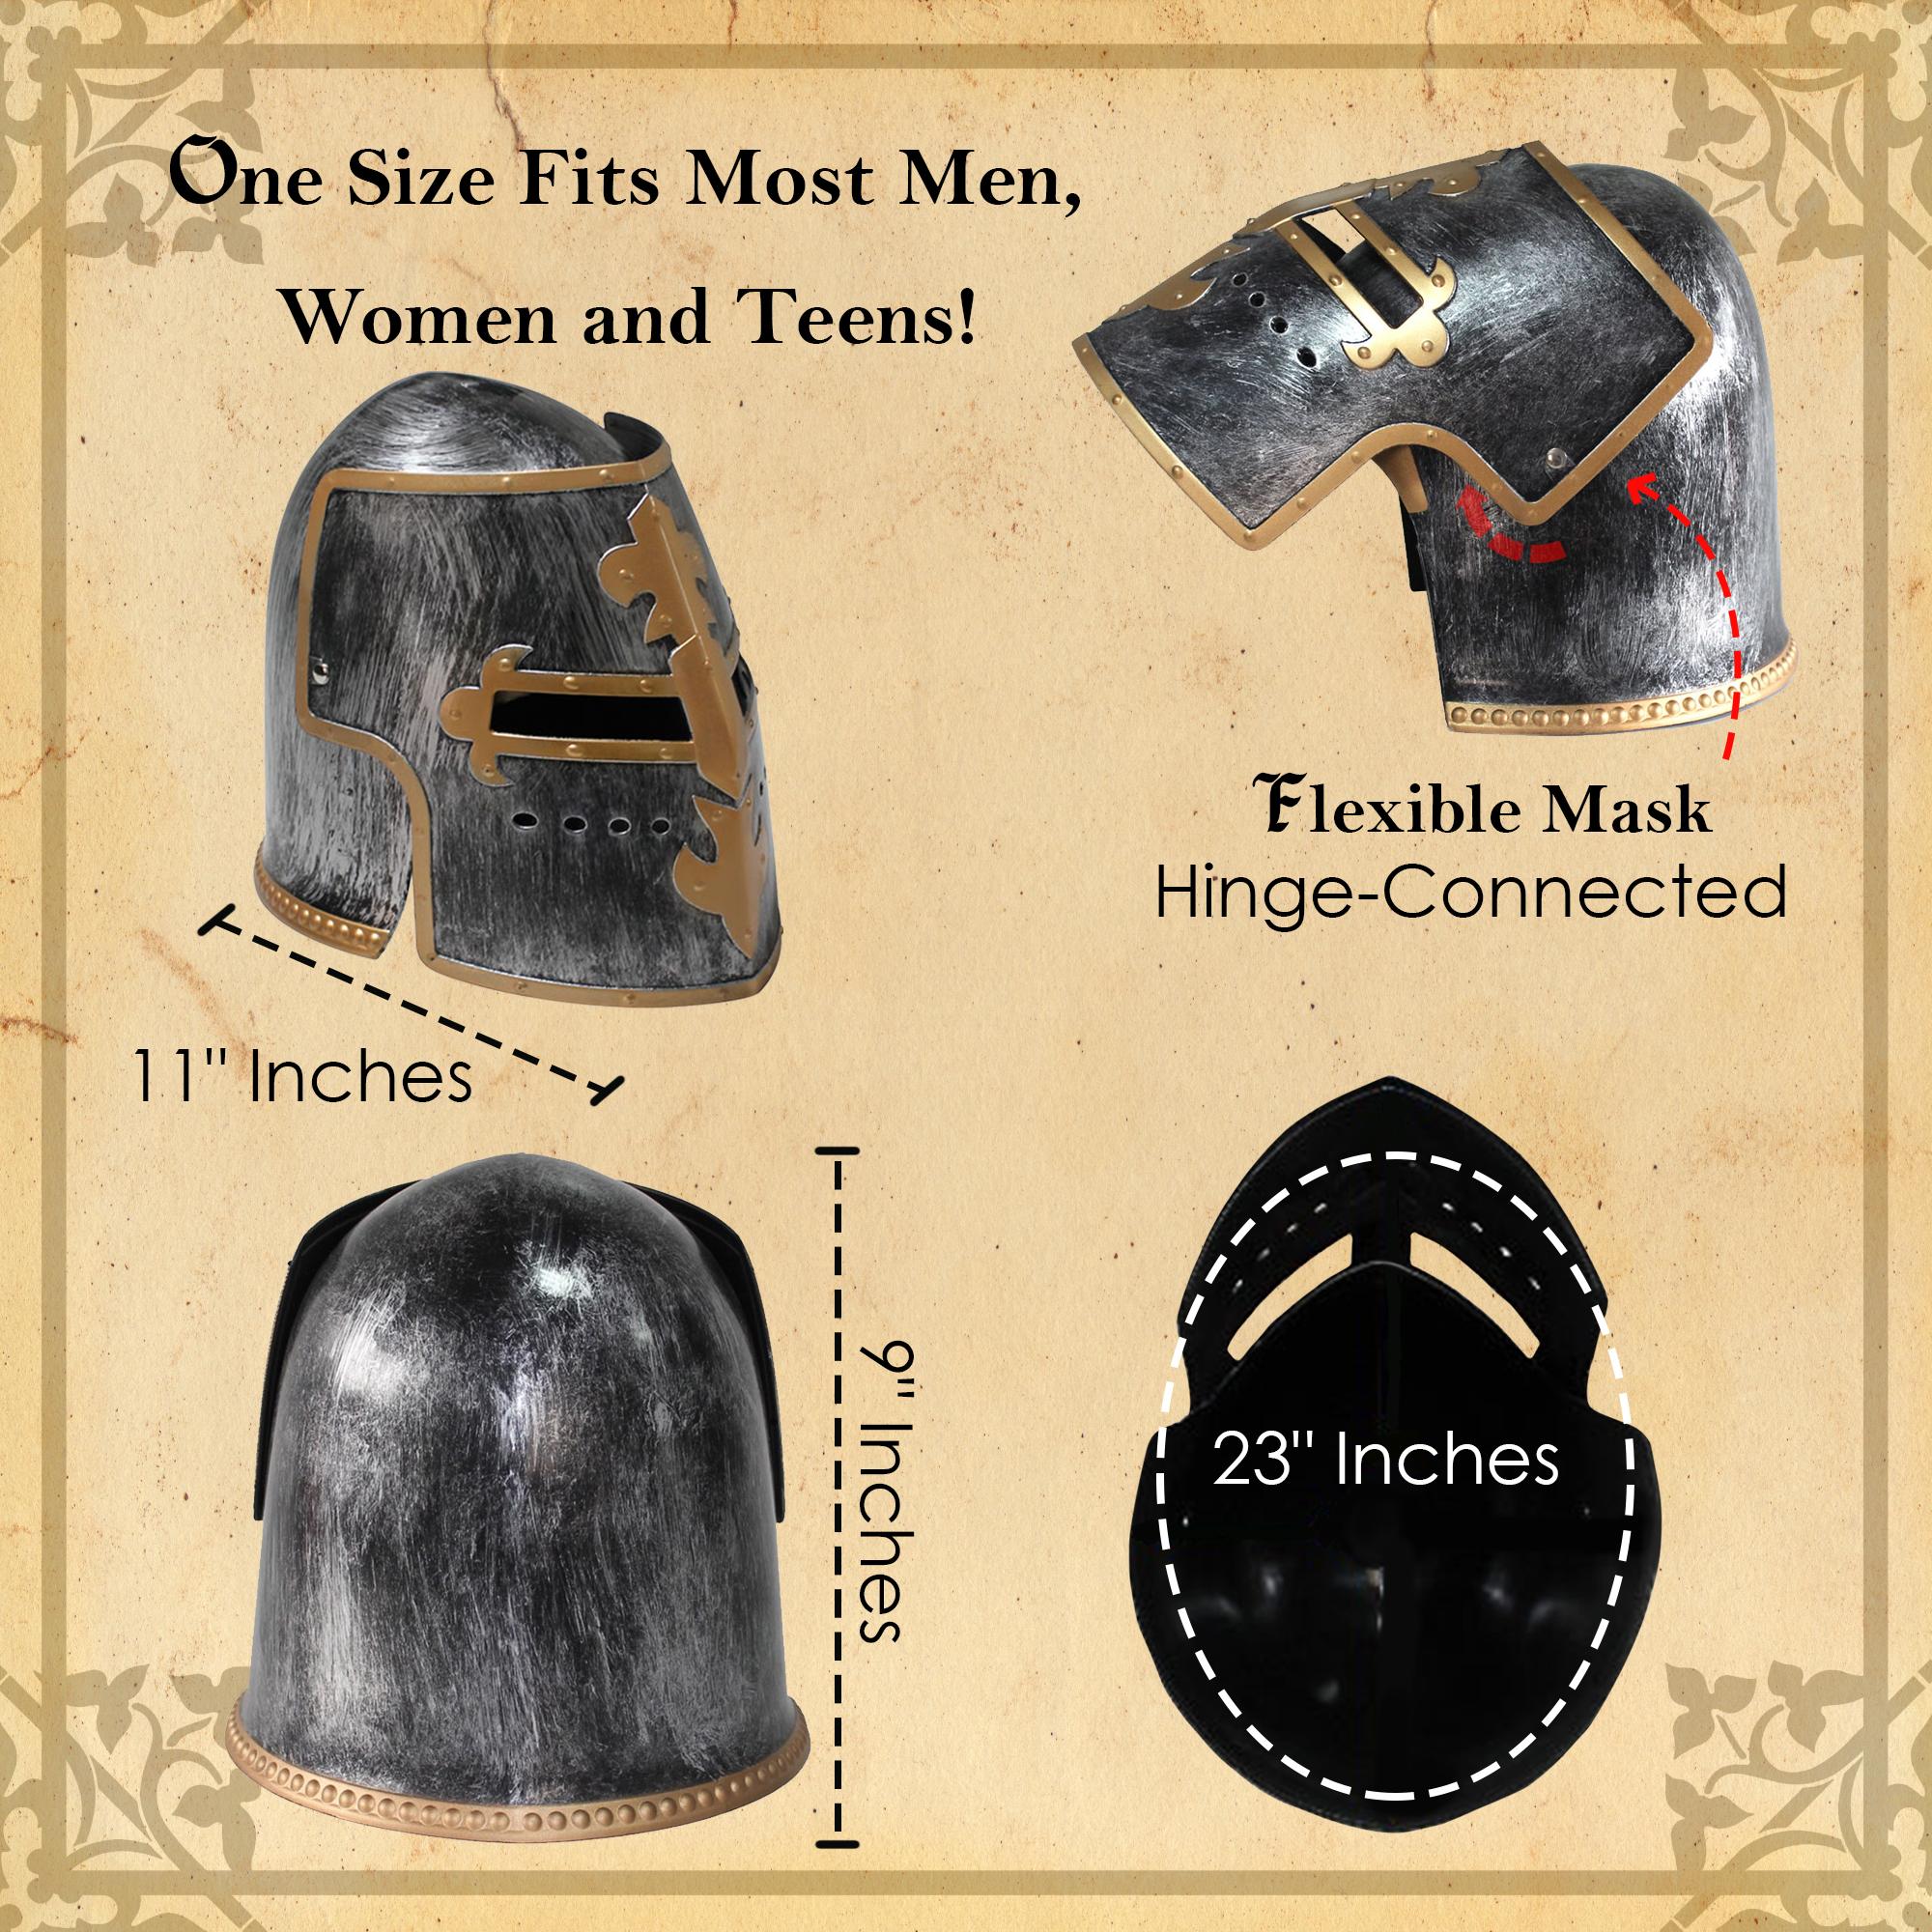 thumbnail 9 - Silver Pewter Knight Roman Armor Crusader Helmet Mask Medieval Adult Costume